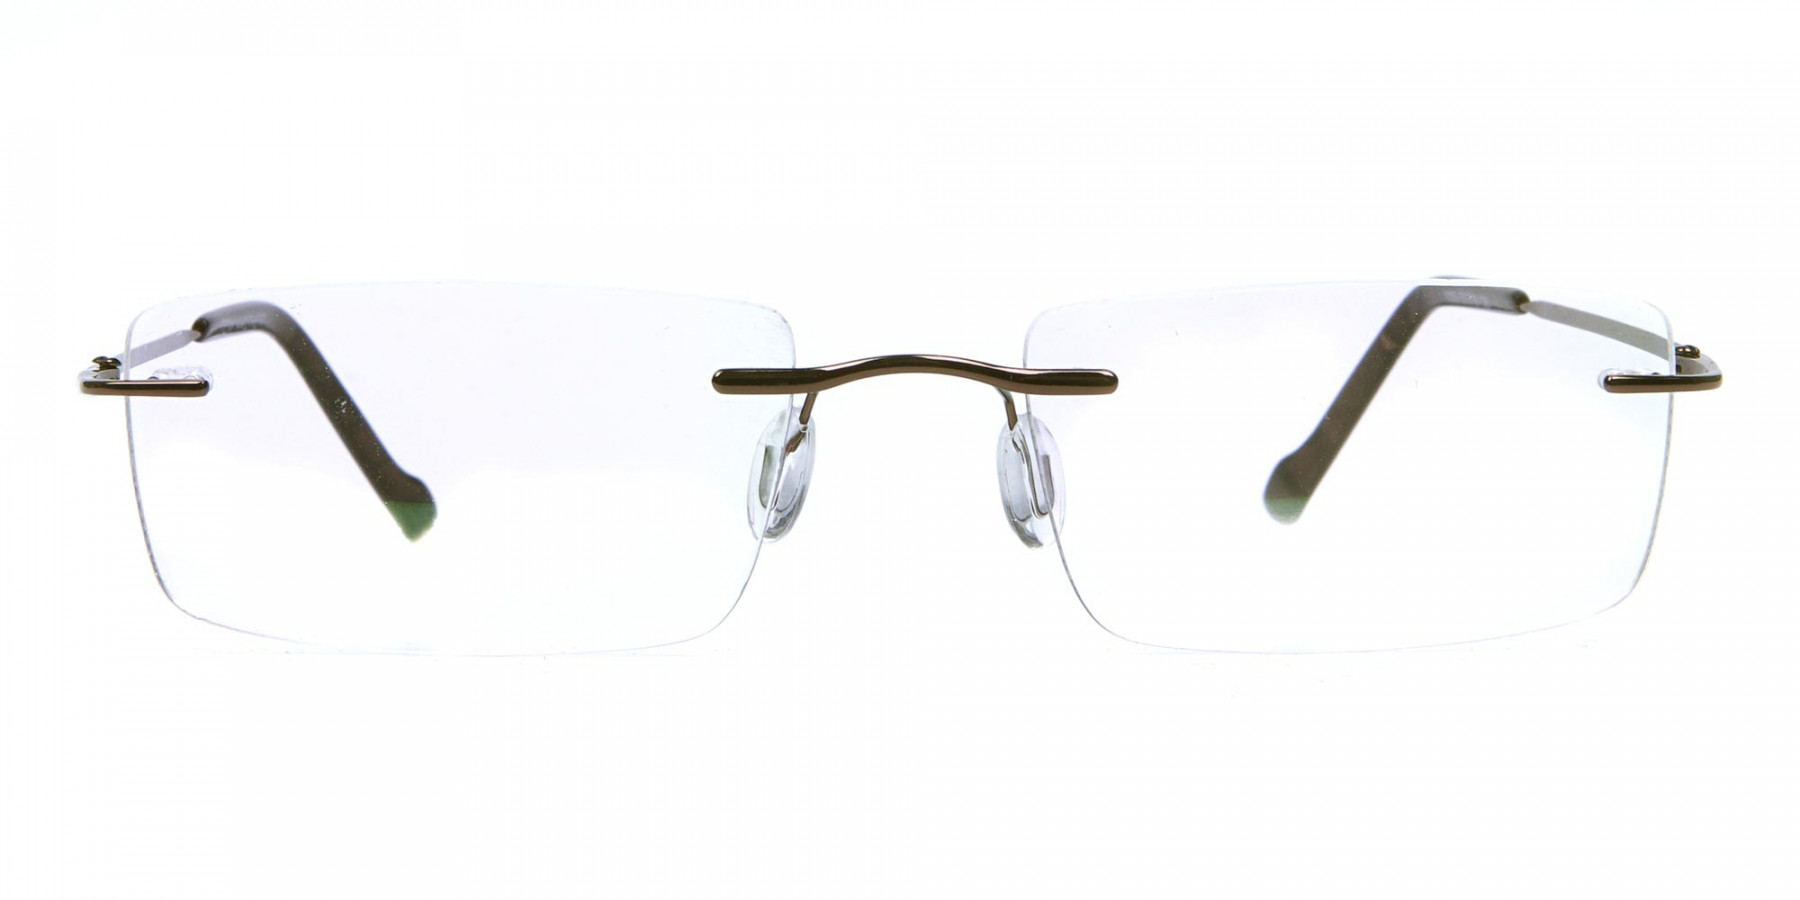 Rimless Glasses in Brown for Men & Women - 1